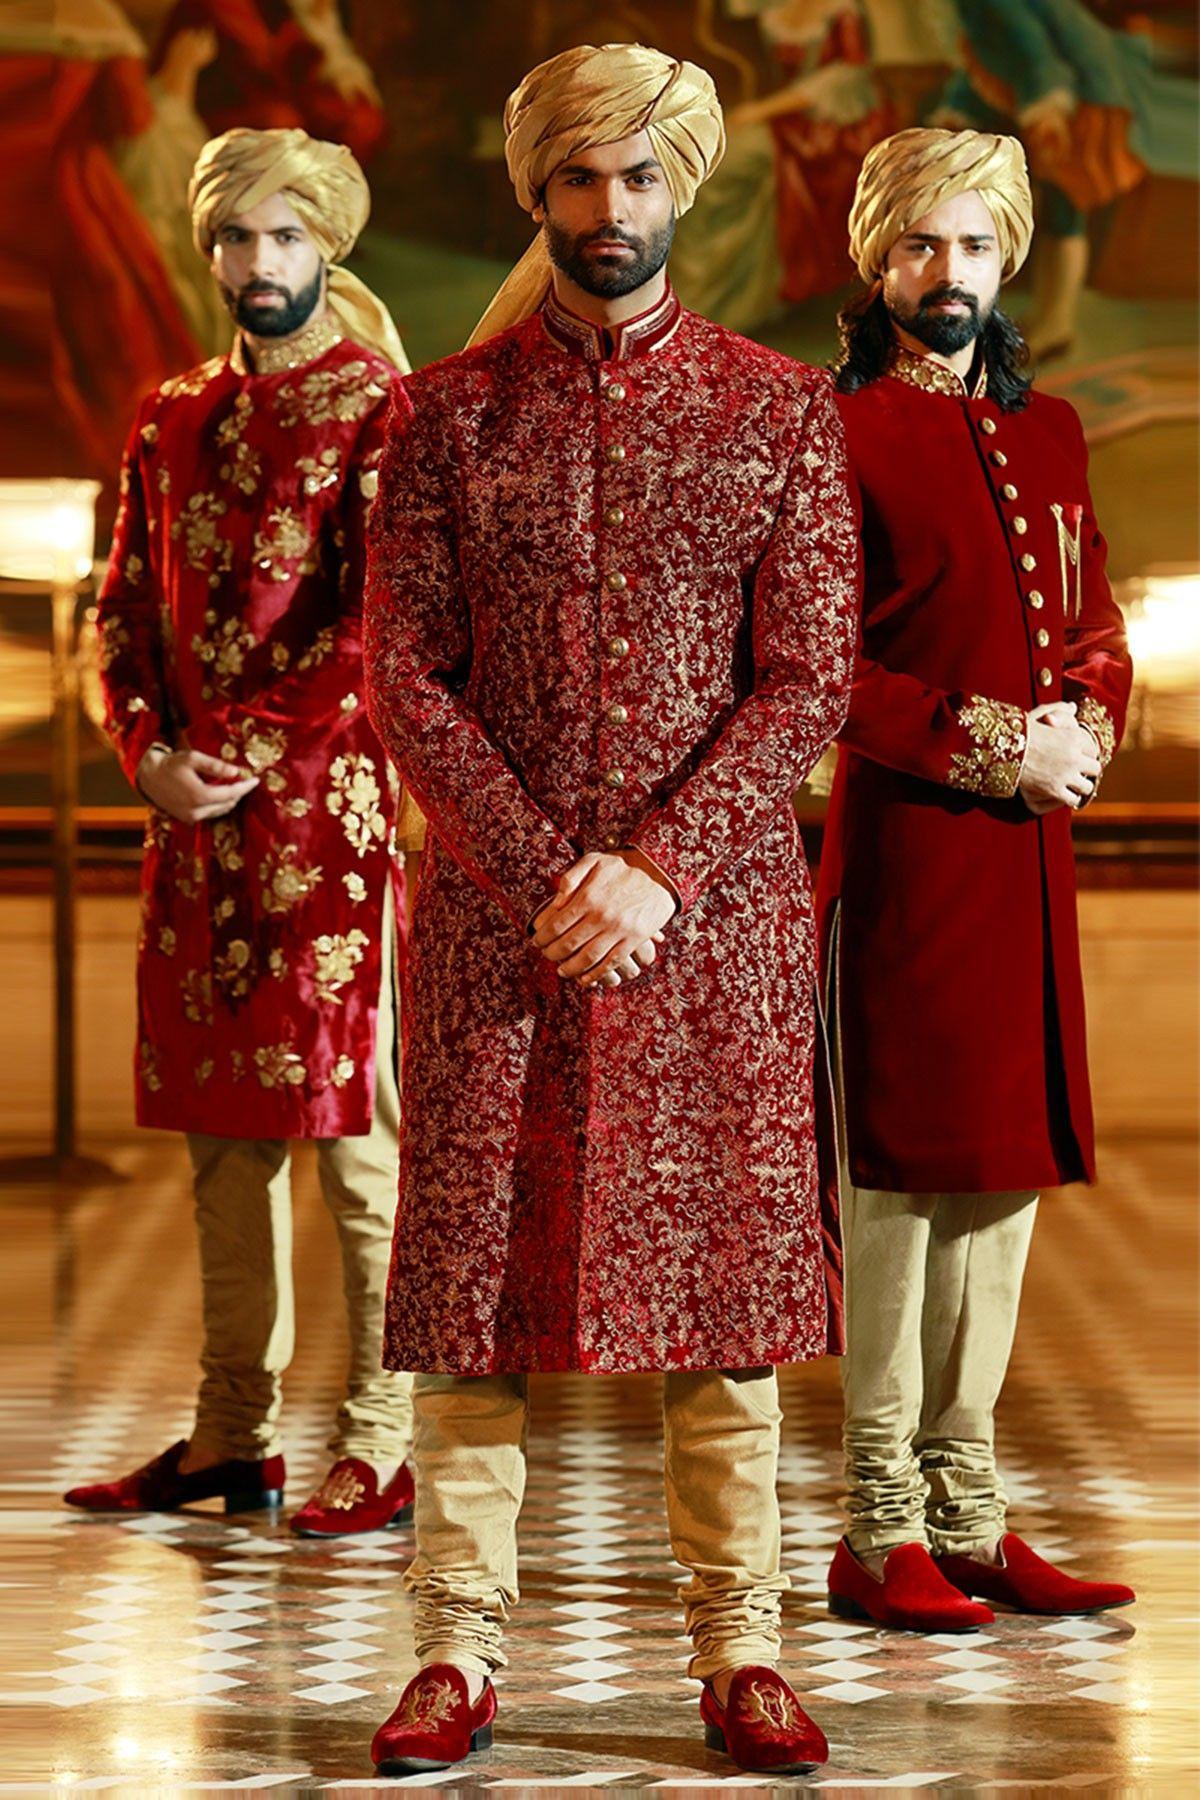 Samyakk Red And Golden Silk Embroidered Achkan Sherwani | Men's